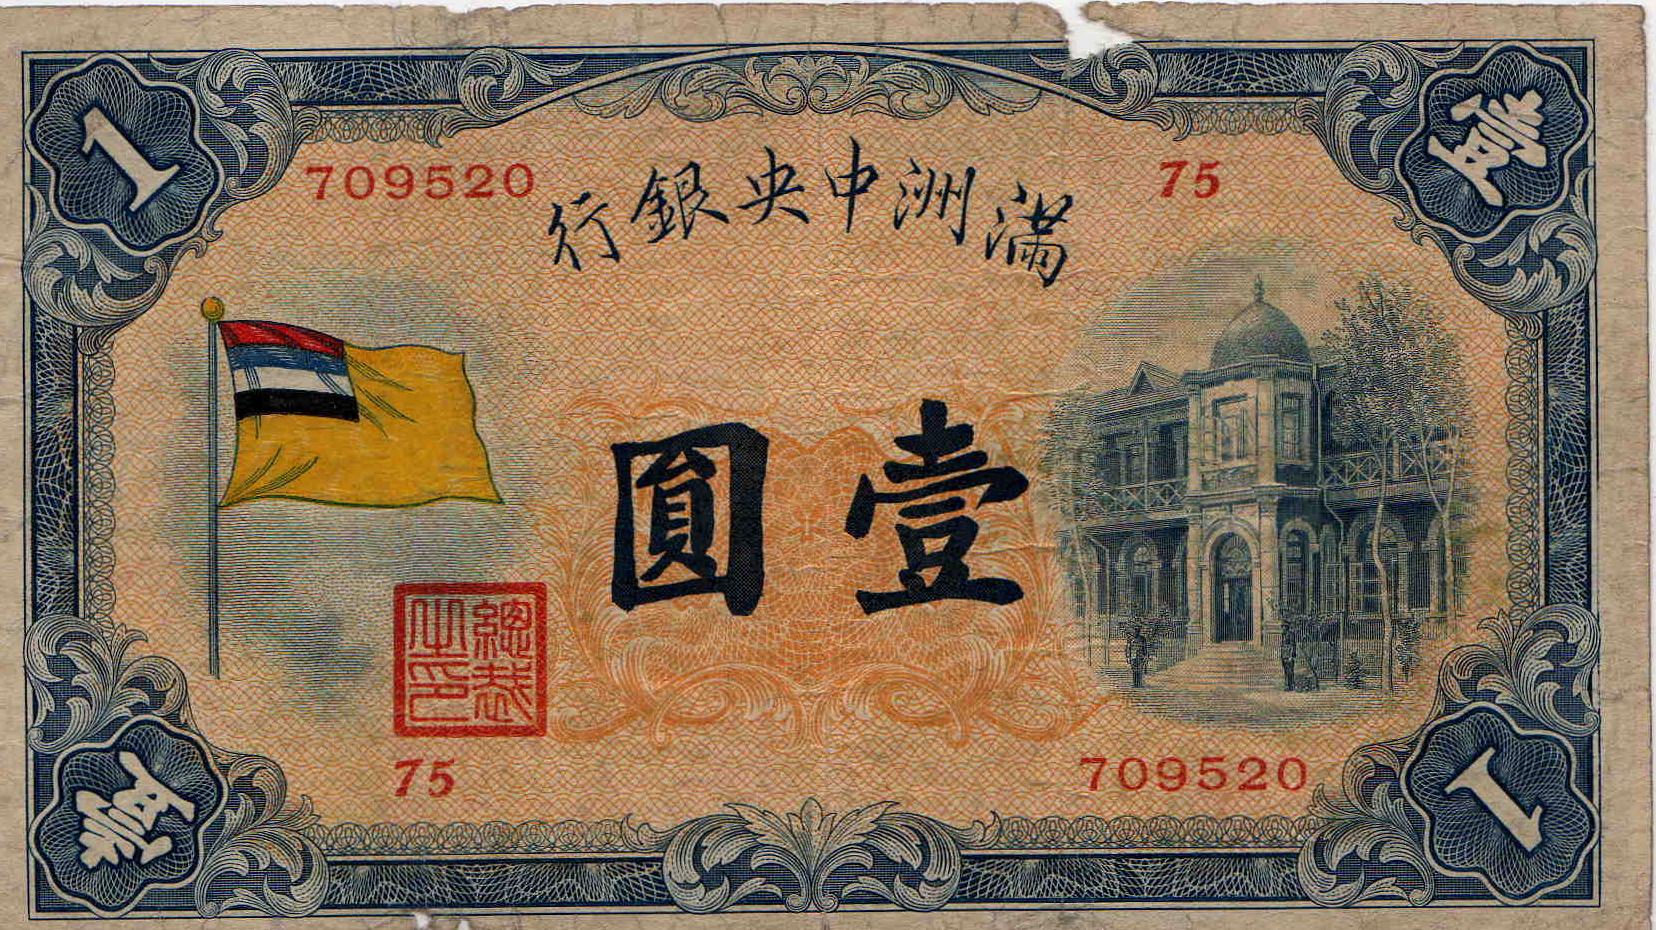 Billet de 1 yuan émis par la Banque du Mandchoukouo